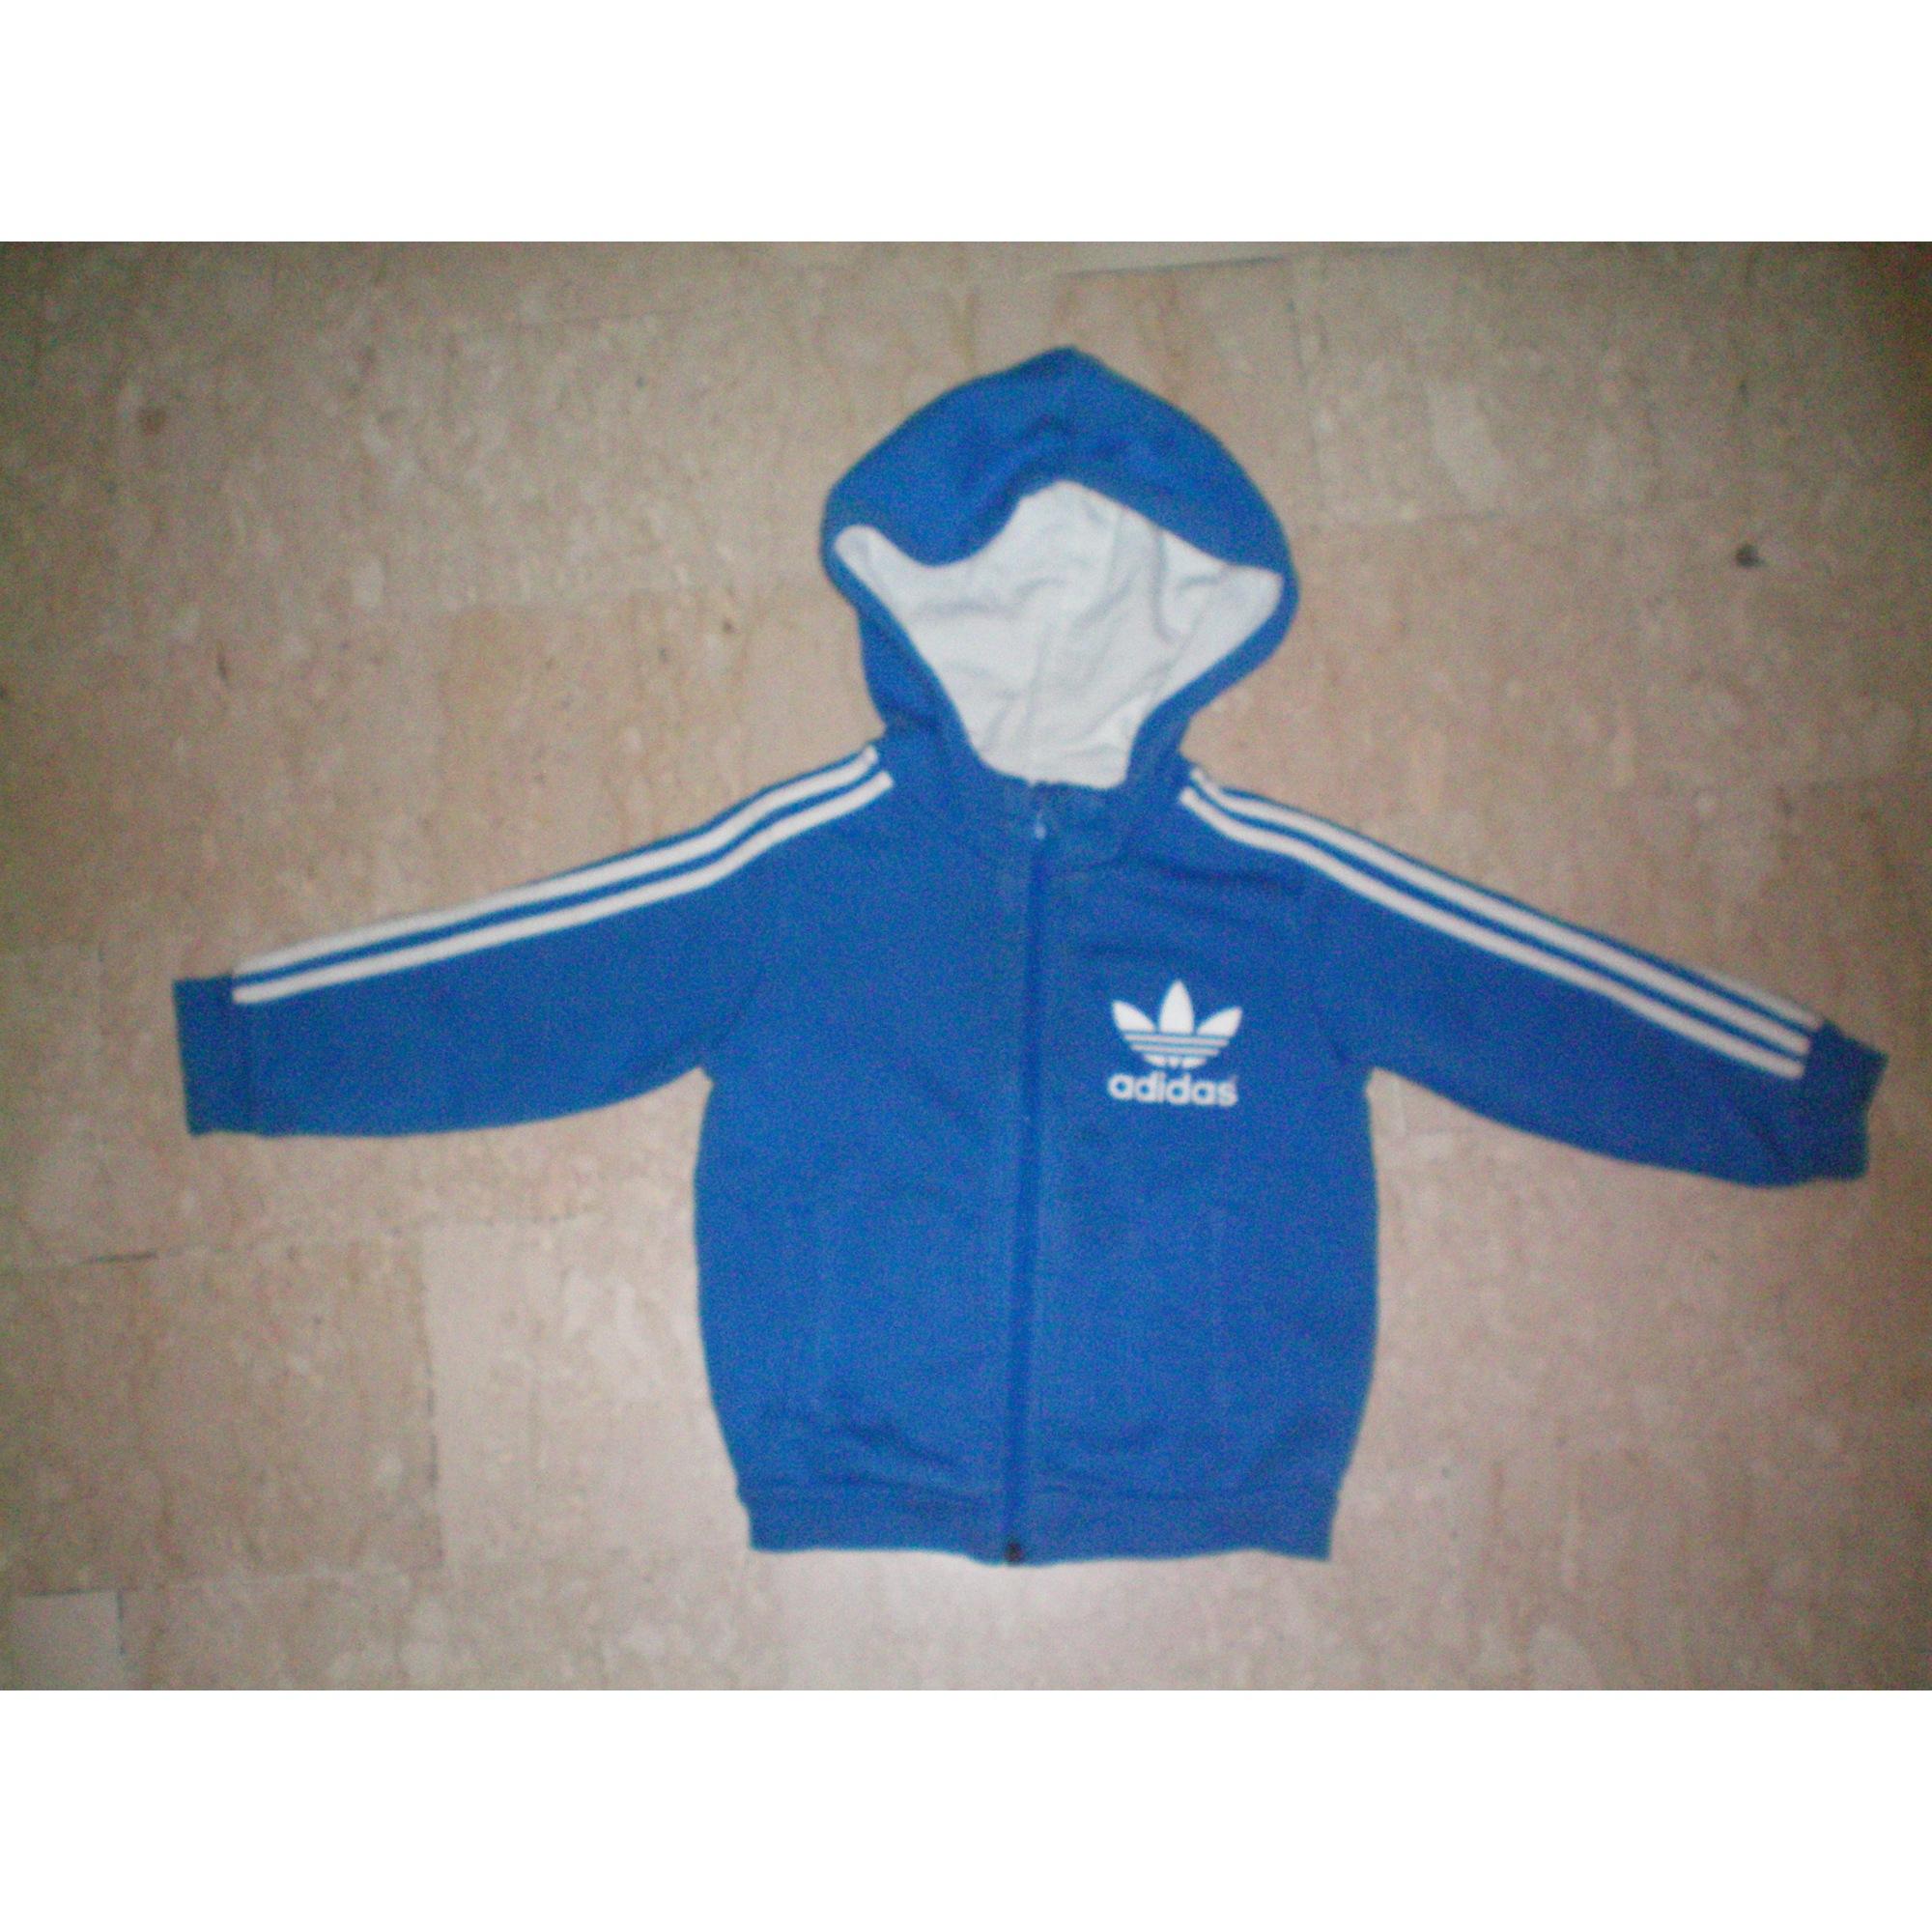 Veste ADIDAS Bleu, bleu marine, bleu turquoise